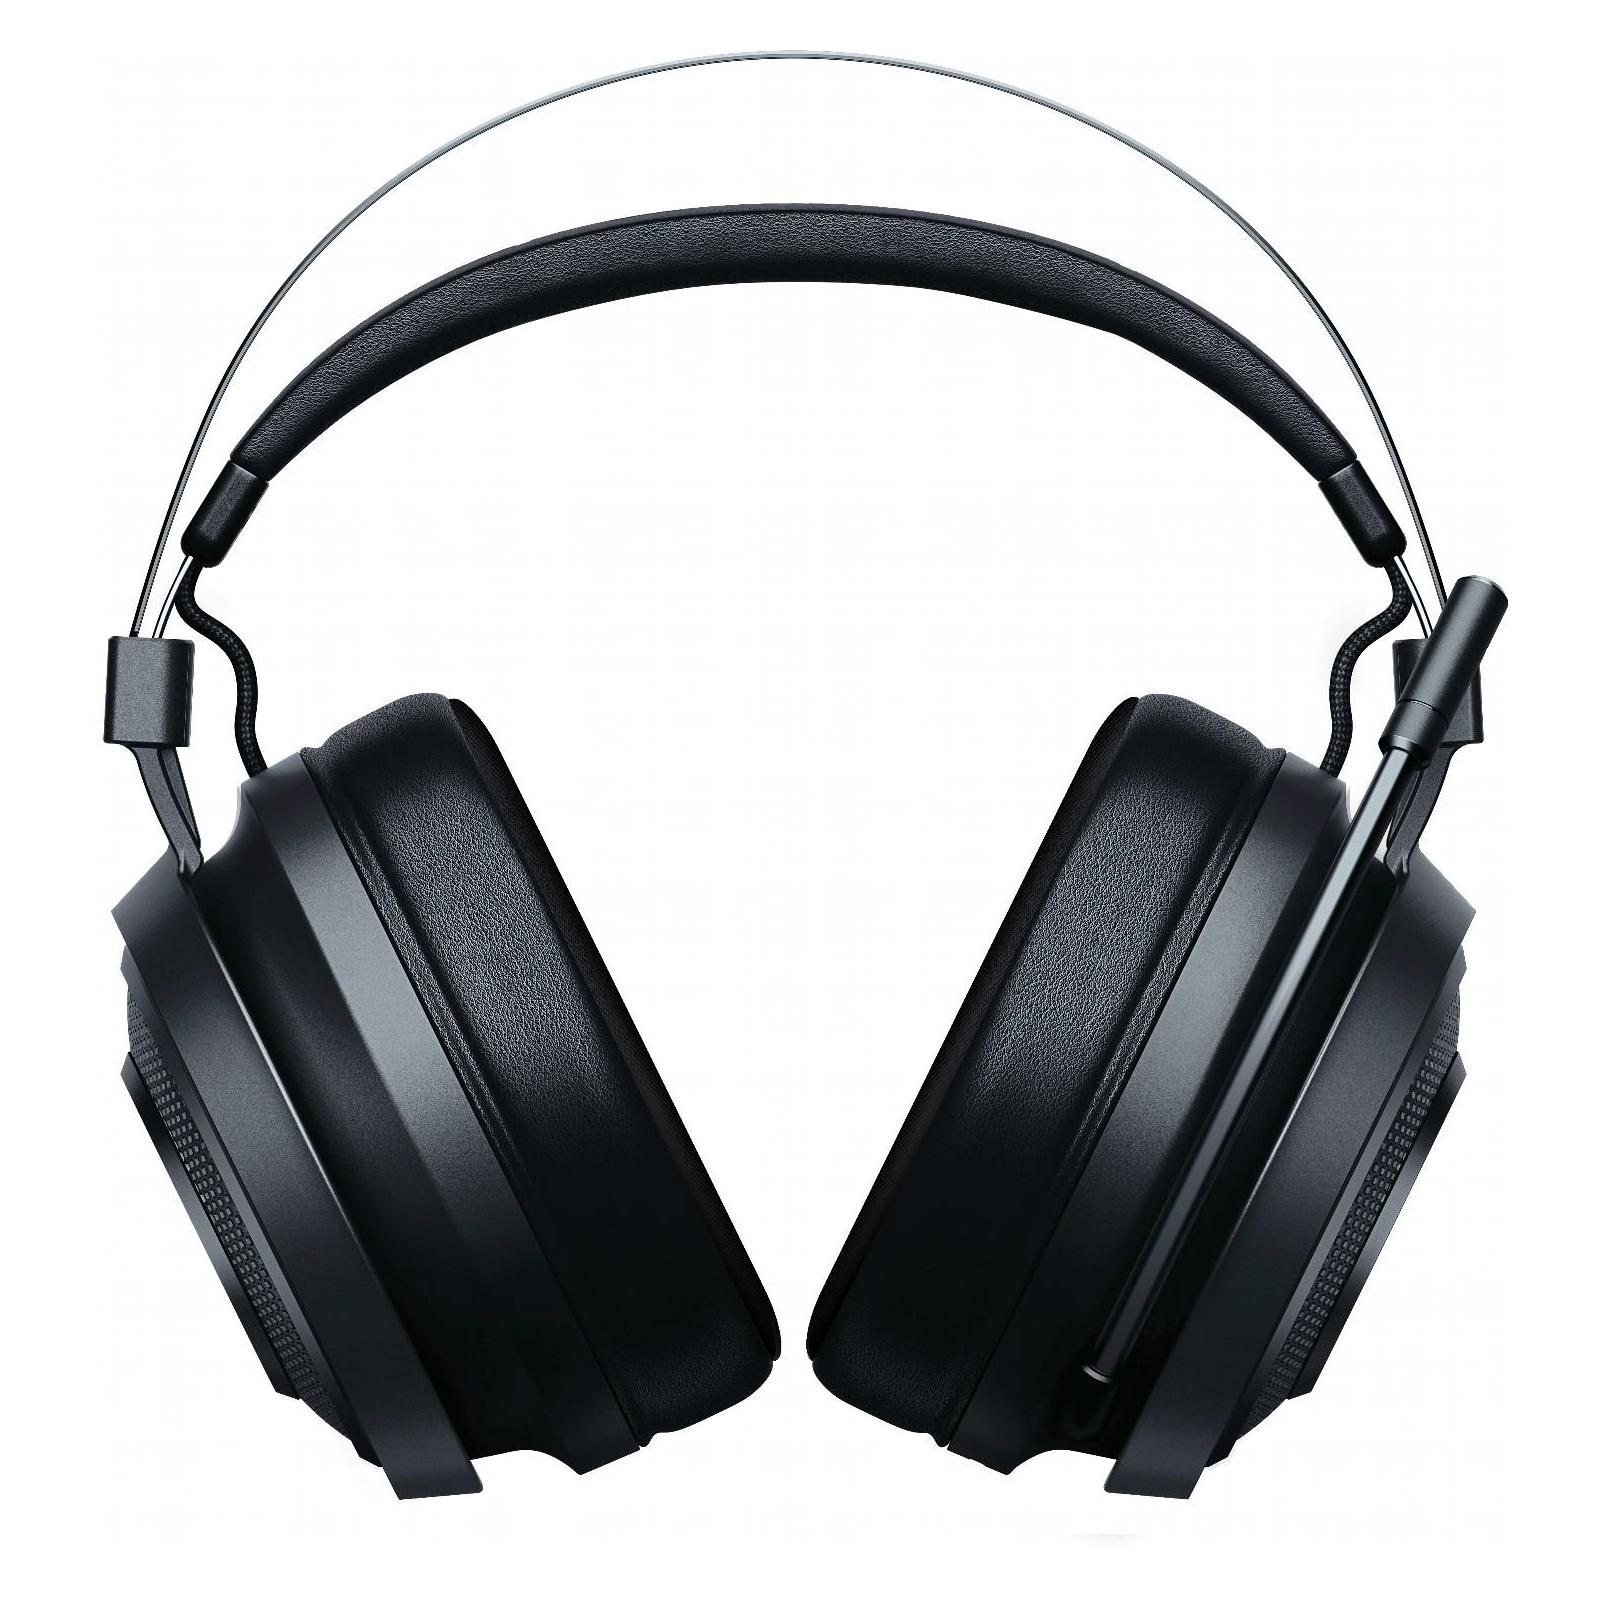 Наушники Razer Nari Essential (RZ04-02690100-R3M1) изображение 5